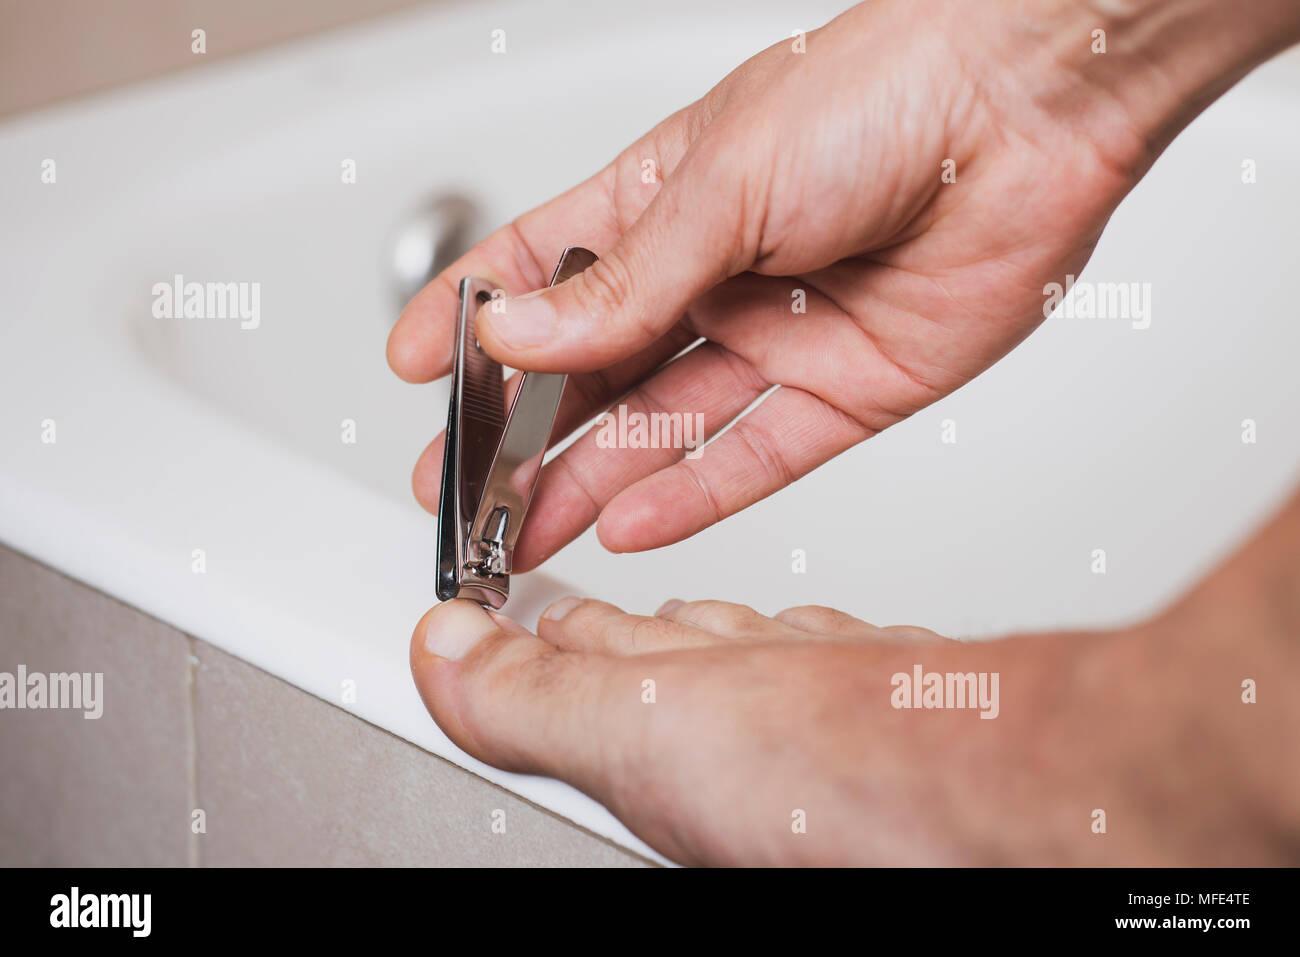 Cutting Toe Nails Stock Photos & Cutting Toe Nails Stock Images - Alamy